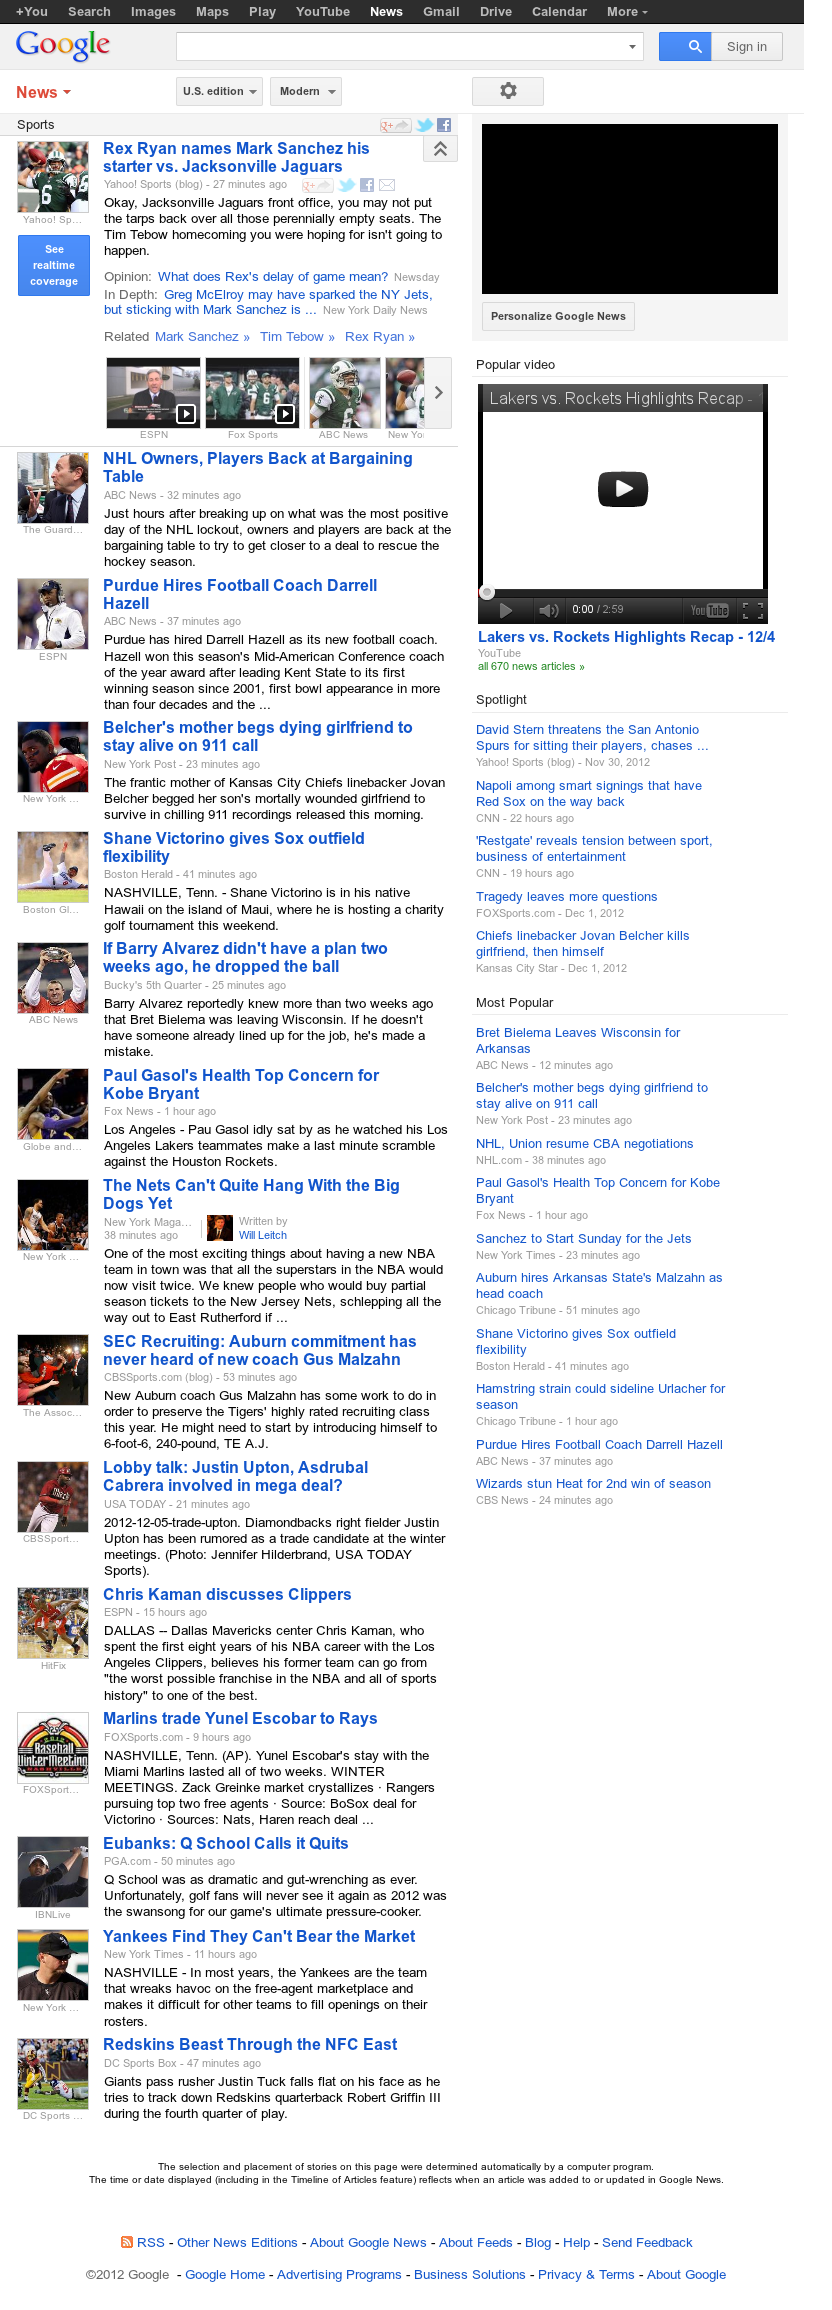 Google News: Sports at Wednesday Dec. 5, 2012, 3:18 p.m. UTC